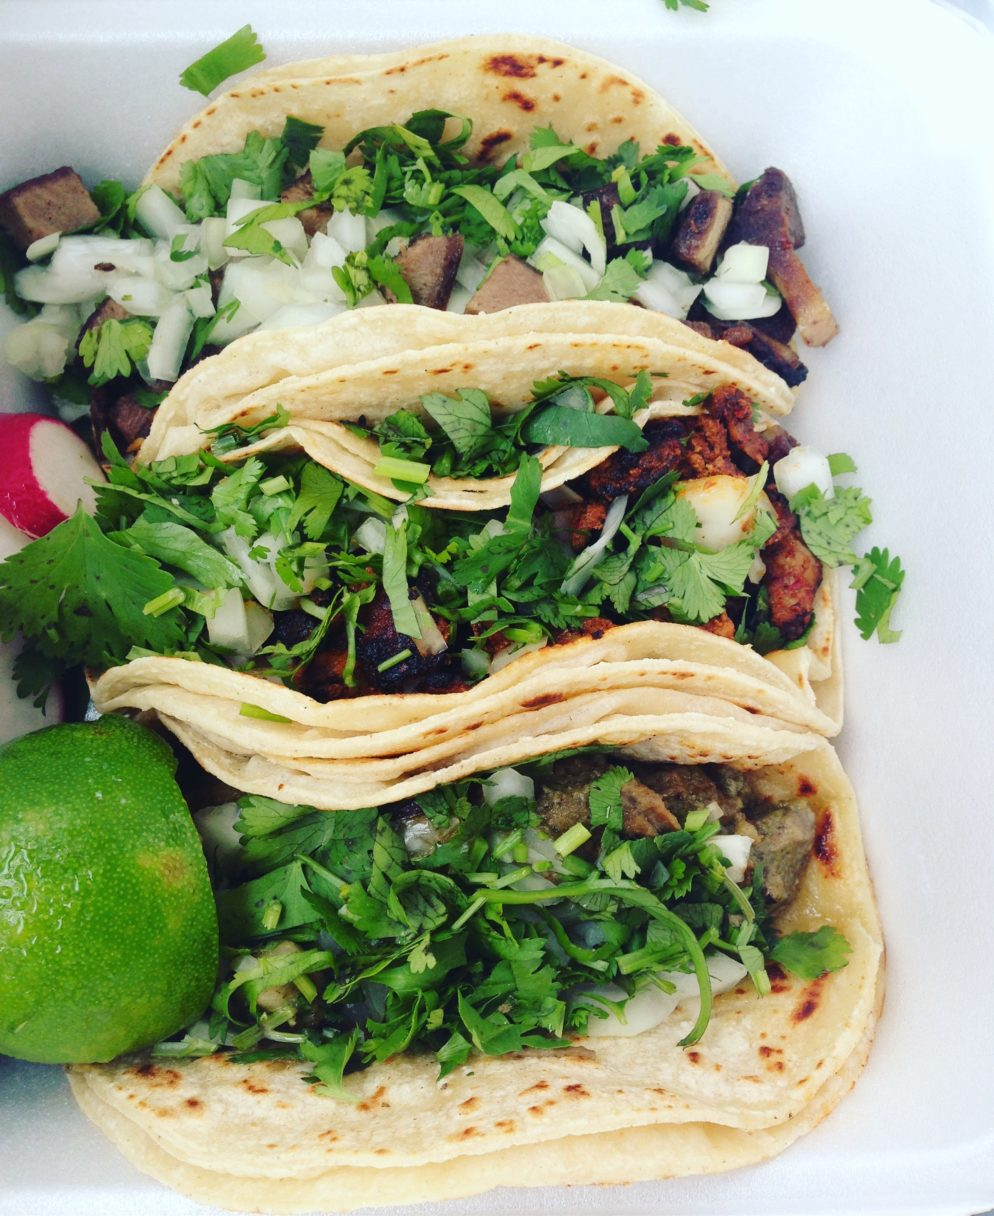 Cheap Eats 2017: La Mexicana Bakery & Taqueria